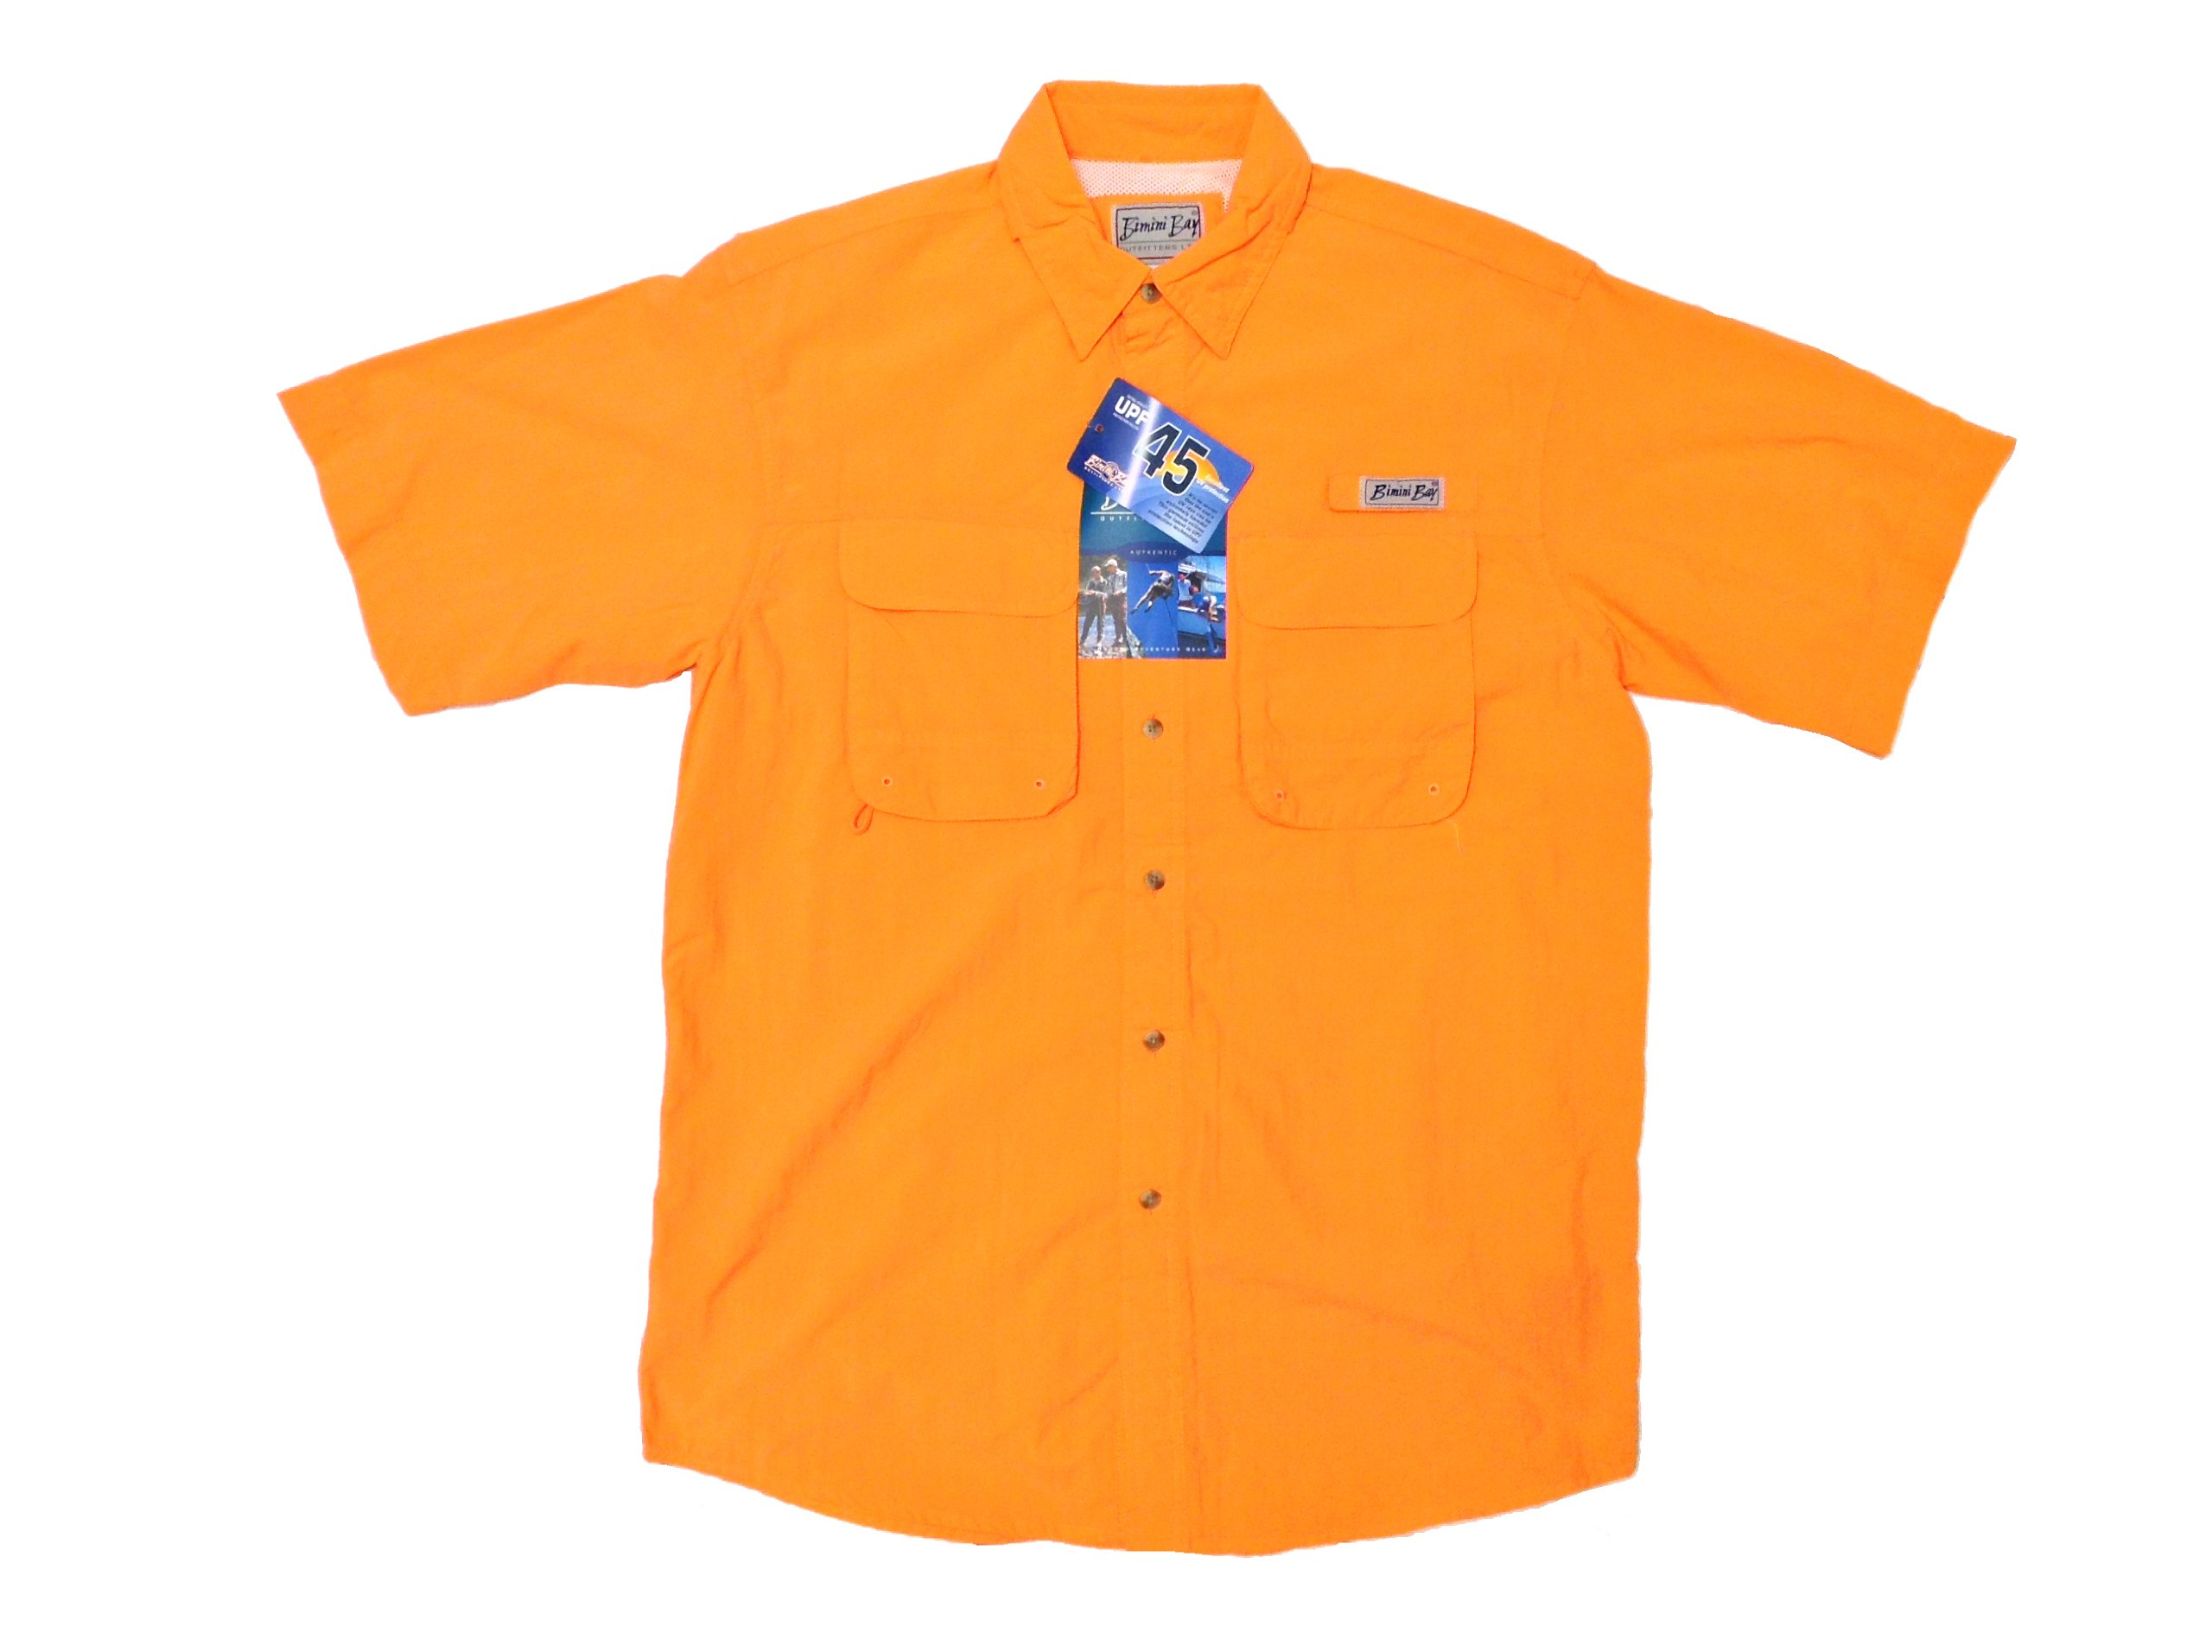 Bimini Bay Outfitters Bimini Flats II Short Sleeve Shirt by Bimini Bay Outfitters